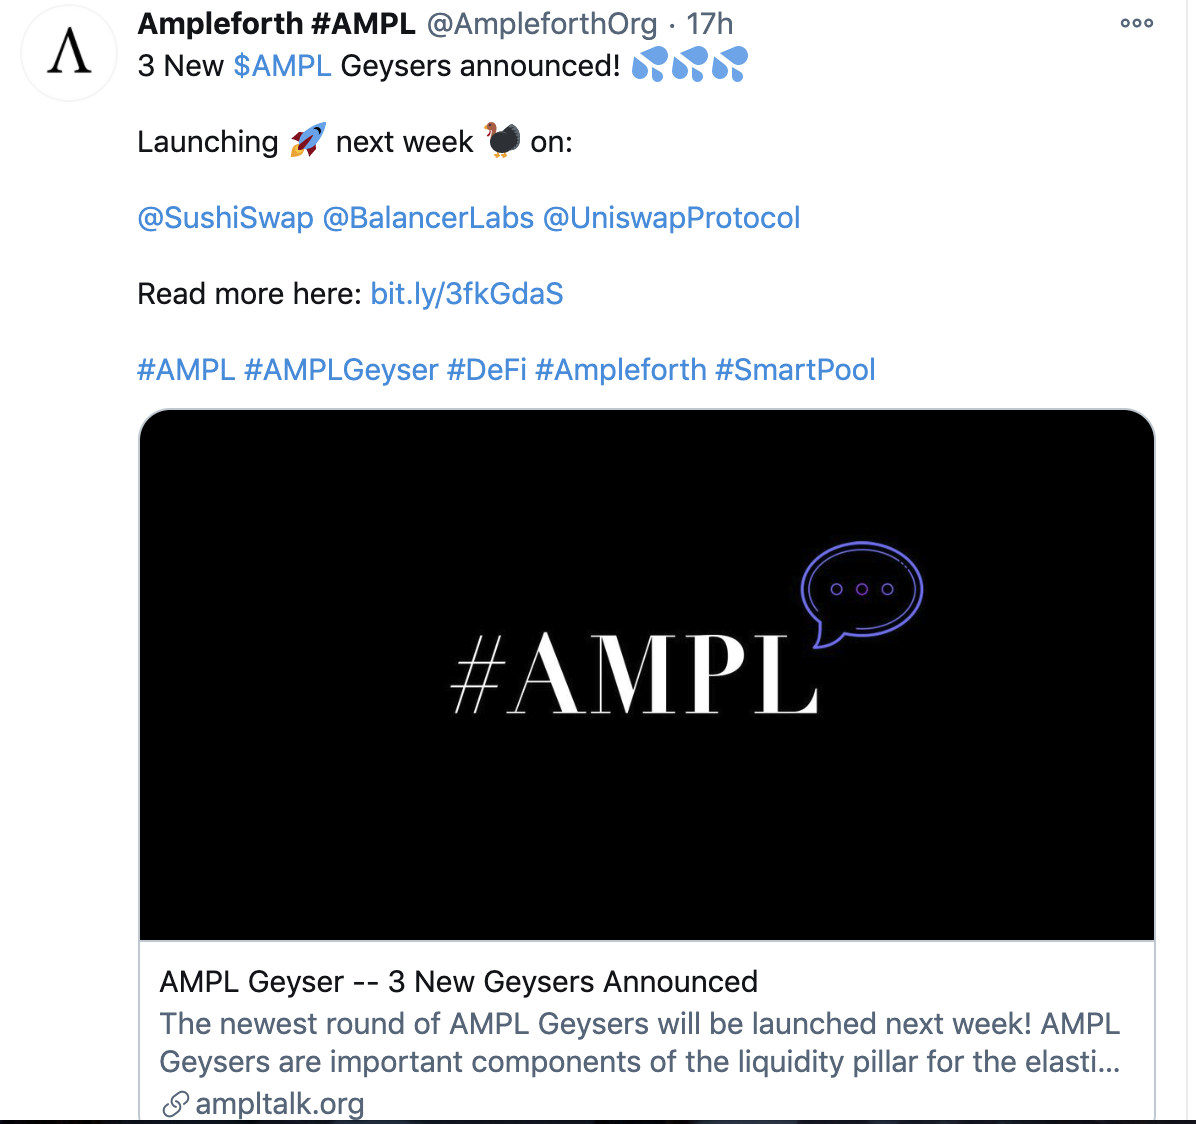 AMPL间歇泉V3来了,3个新池奖励390万个AMPL,这次有什么不一样